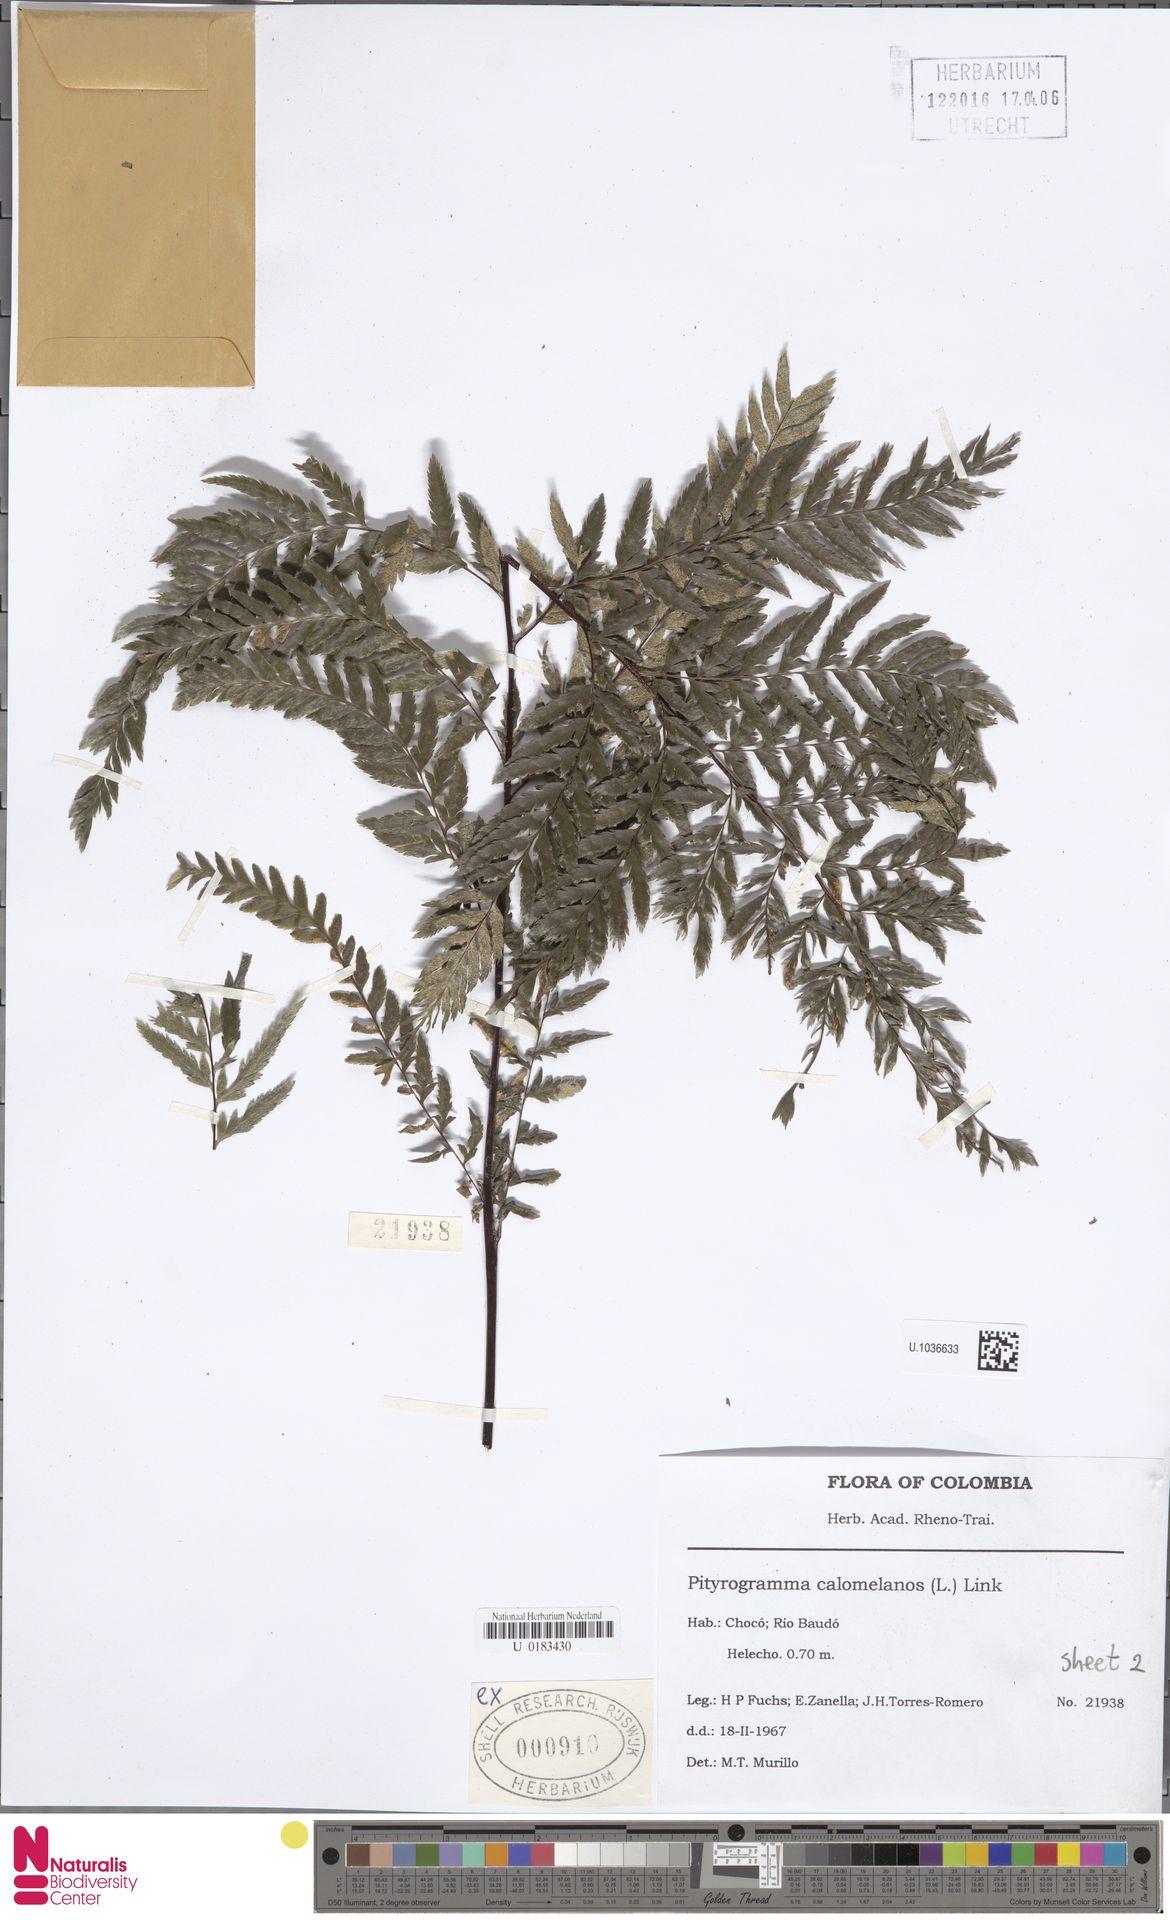 U.1036633 | Pityrogramma calomelanos (L.) Link